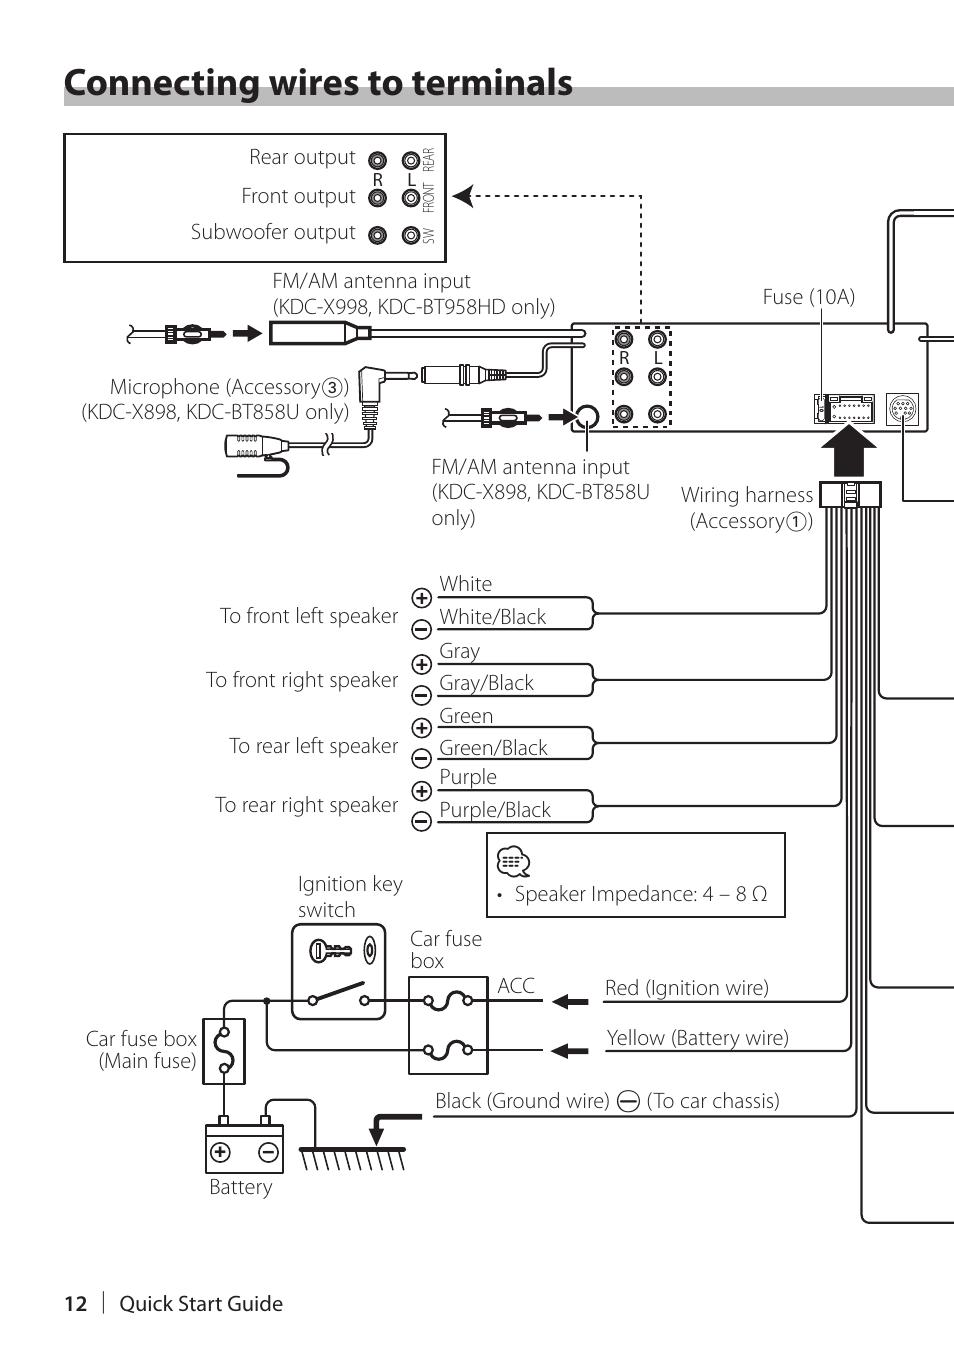 Diagram Ddx418 Kenwood Car Stereo Wiring Diagrams Full Version Hd Quality Wiring Diagrams Lonndiagram Gruppe Freiburg 1 De